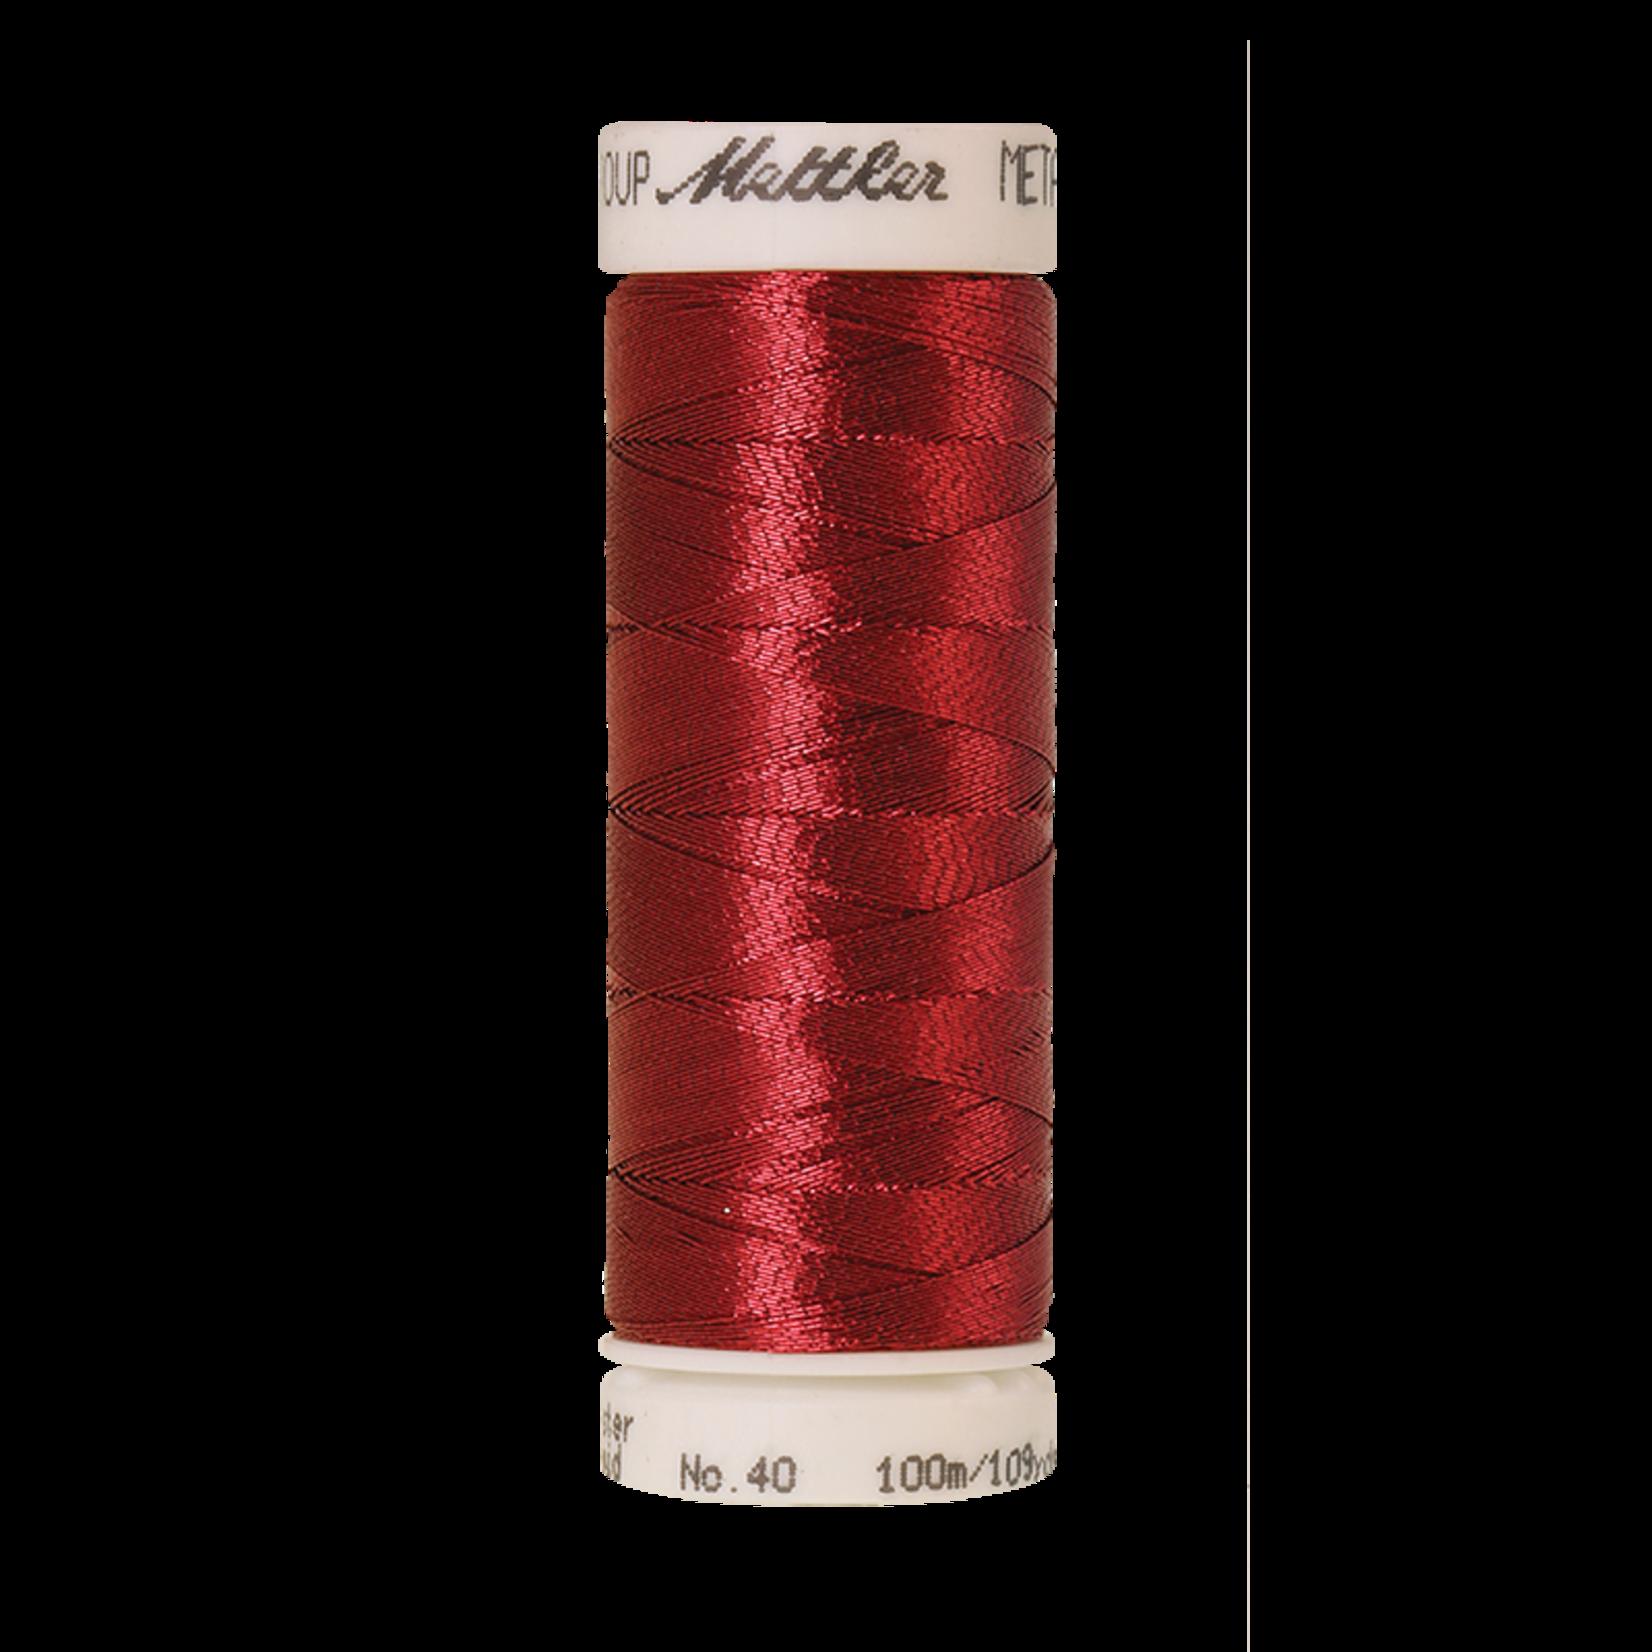 Amann Mettler Metallic - #40 - 100 m - 1723 Bright Rubin